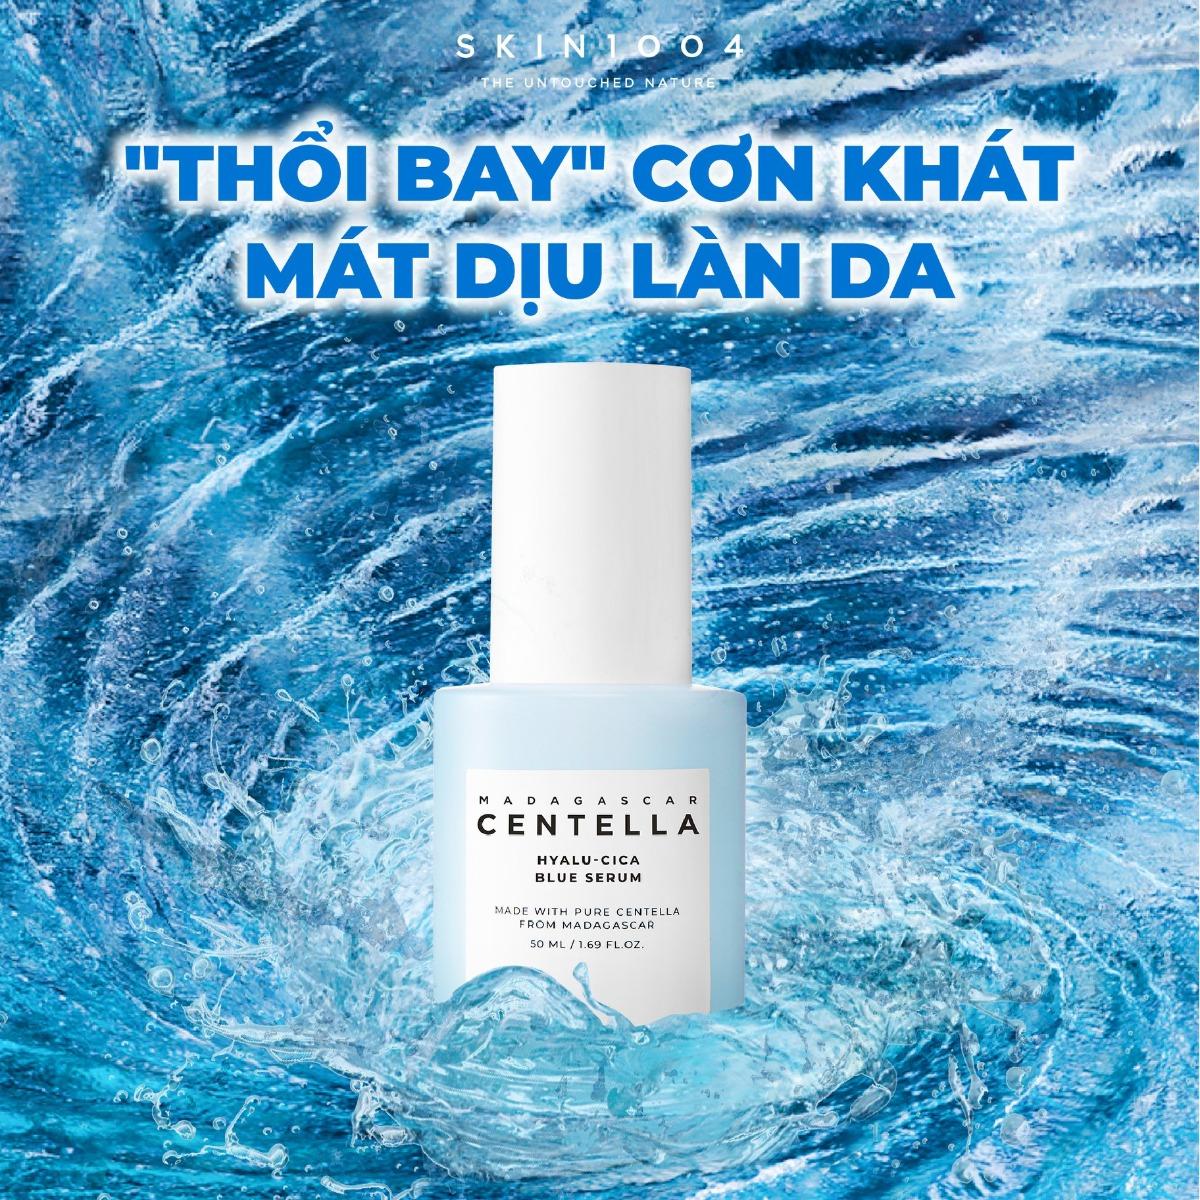 Tinh Chất Skin1004 Madagascar Centella Hyalu-Cica Blue Serum Cấp Ẩm, Làm Dịu & Dưỡng Sáng Da